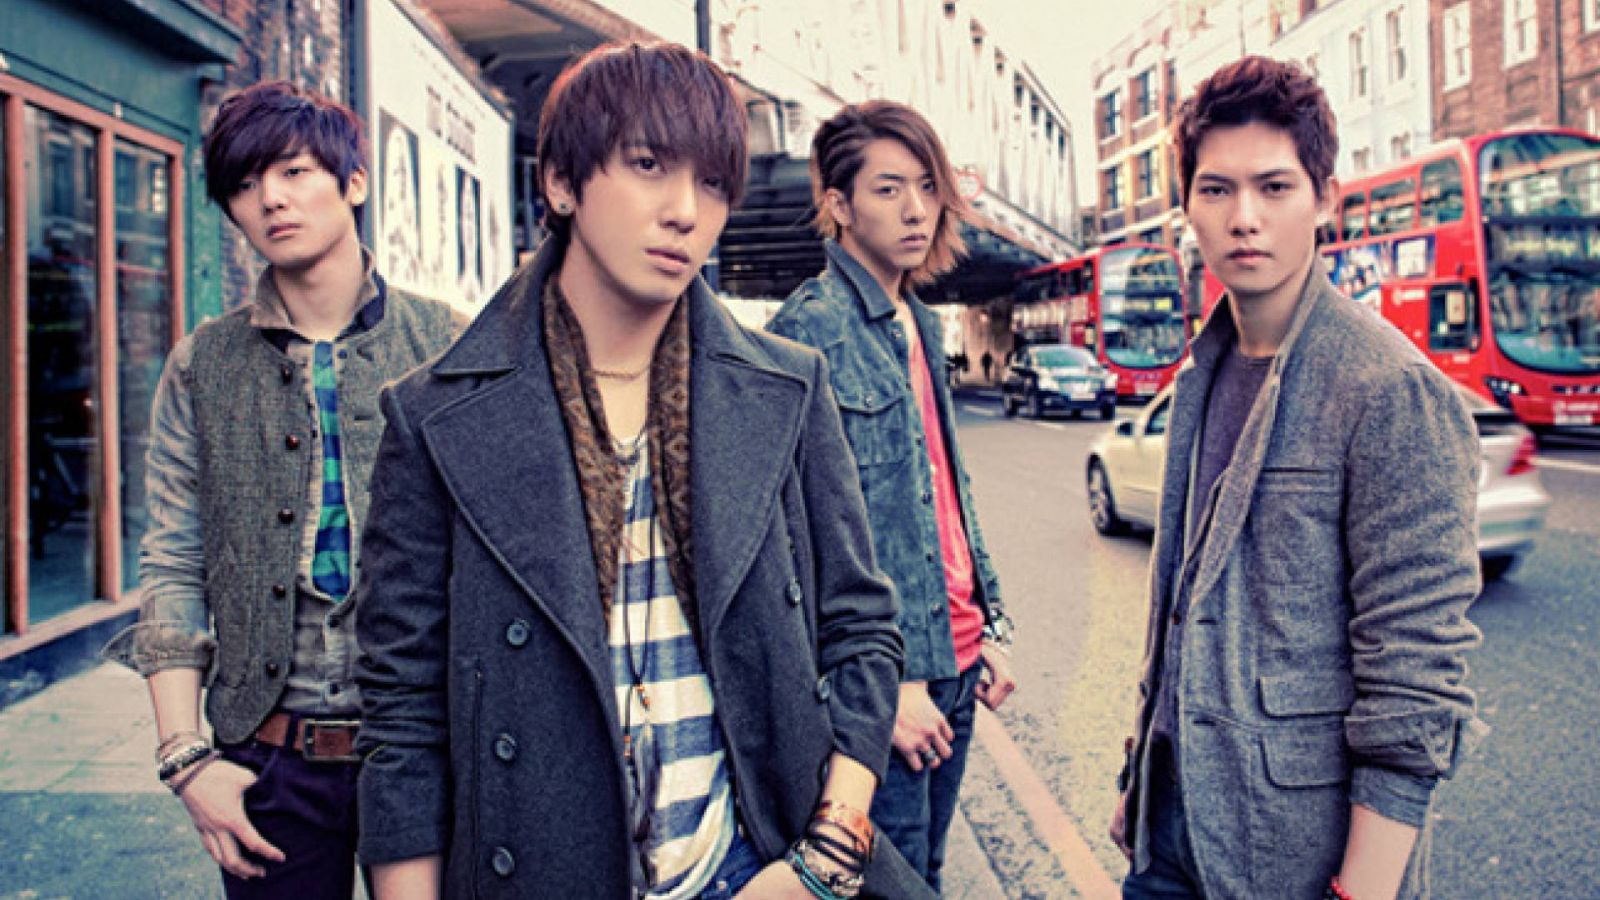 Lady é o novo single japonês do CNBLUE © CNBLUE/F&C Music